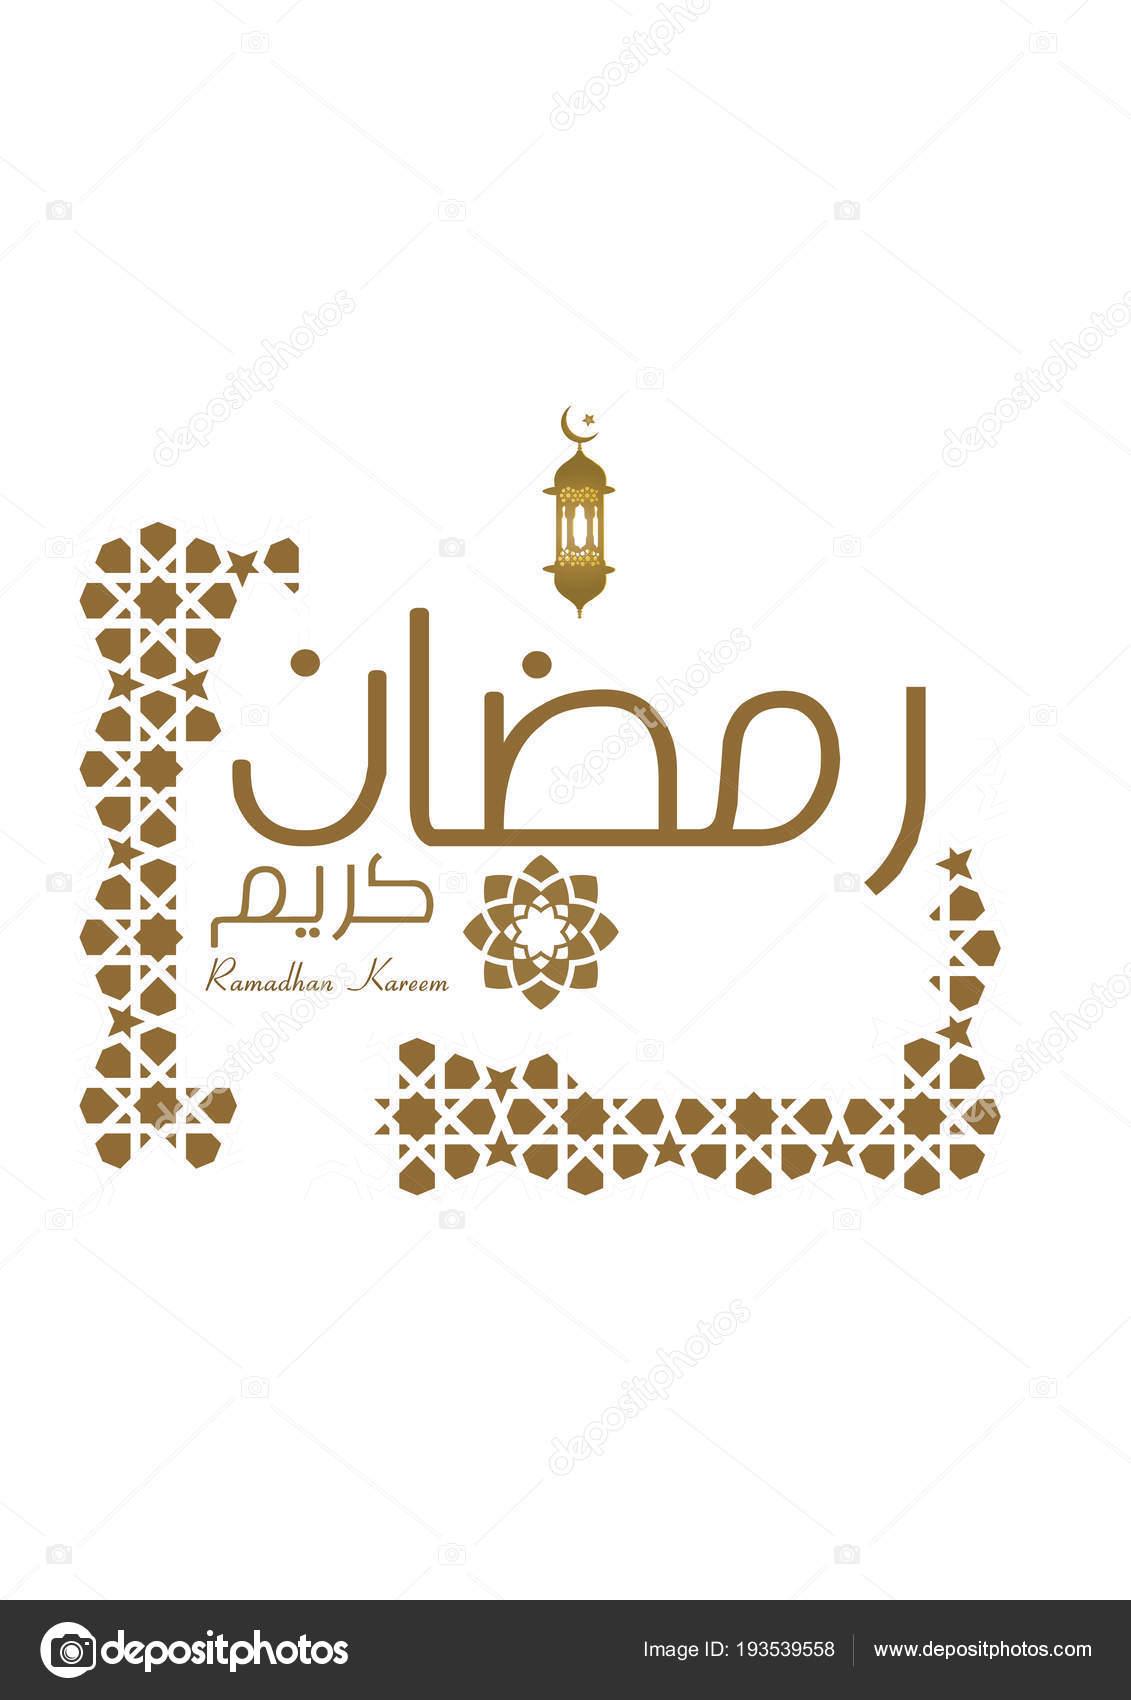 Ramadan kareem greeting cards arabic calligraphy style translation ramadan kareem greeting cards arabic calligraphy style translation generous ramadhan stock vector m4hsunfo